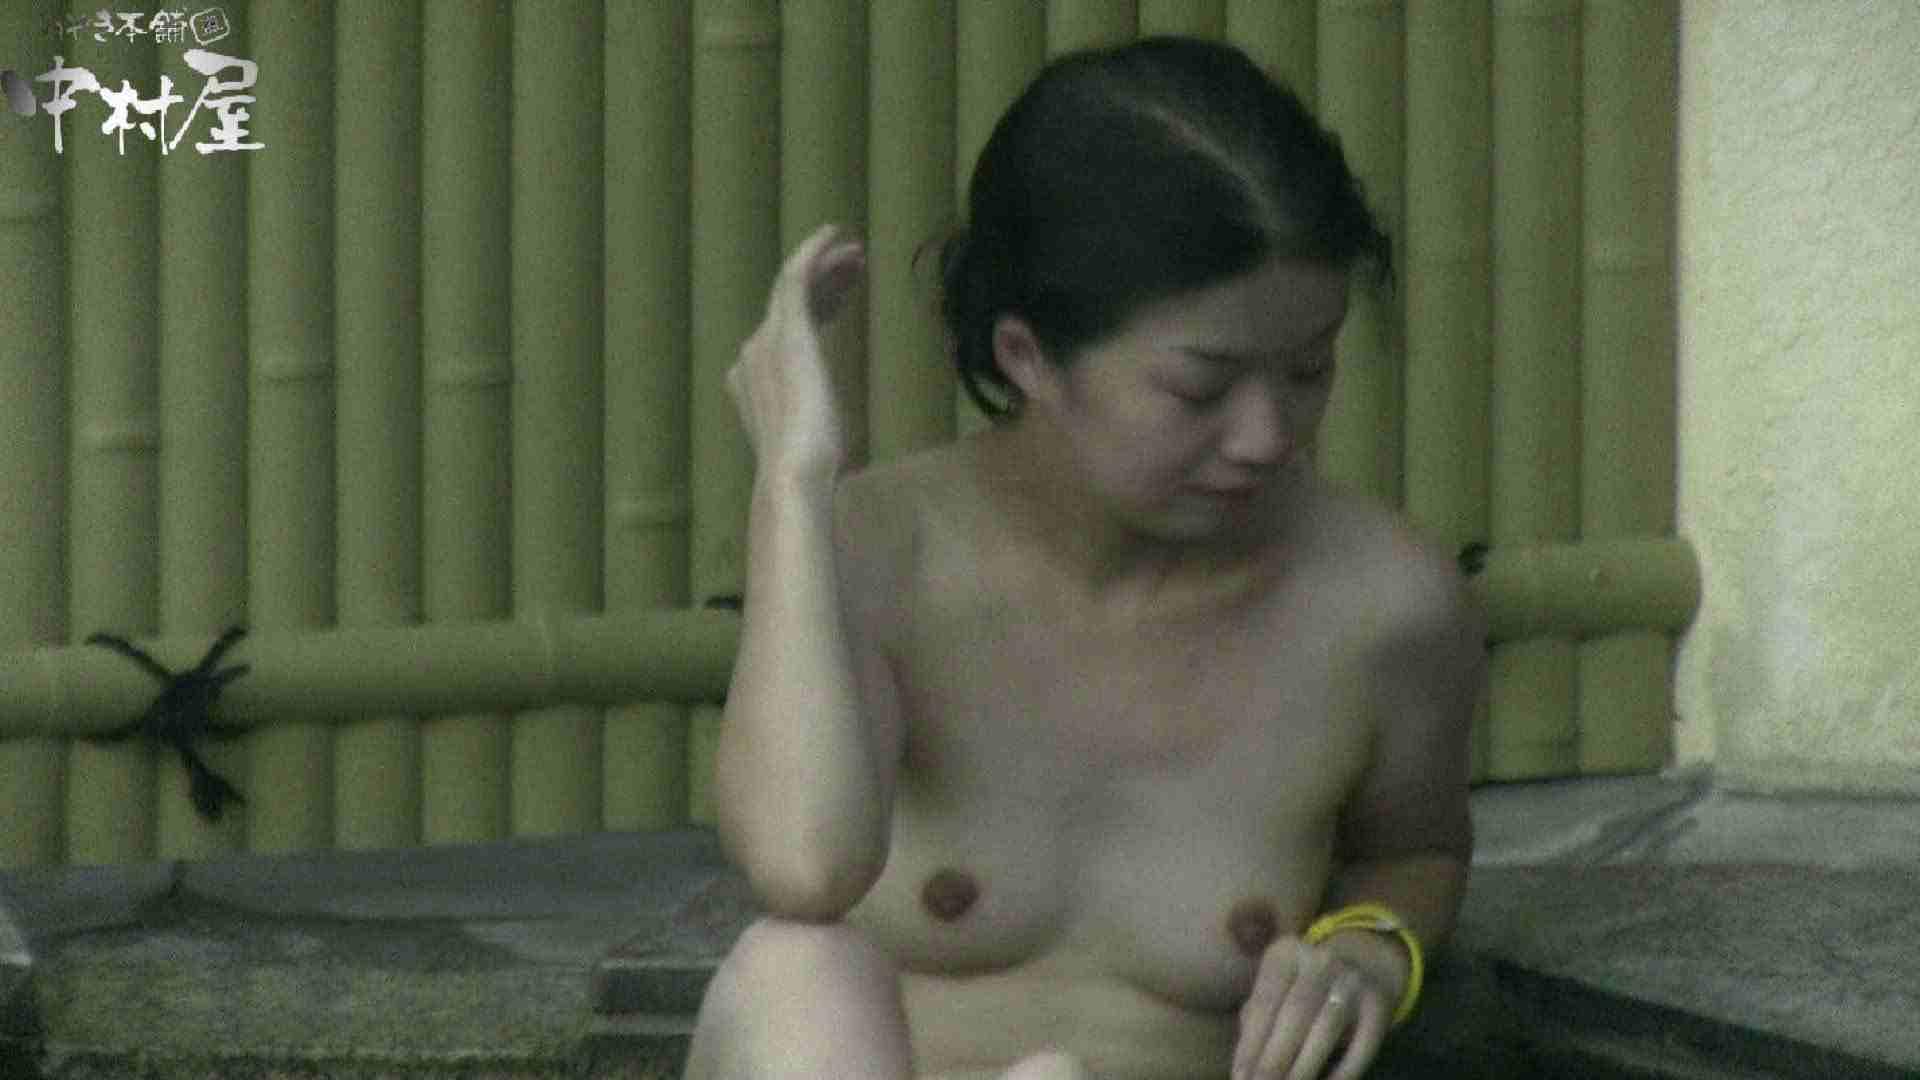 Aquaな露天風呂Vol.904 美しいOLの裸体 オメコ動画キャプチャ 103pic 23